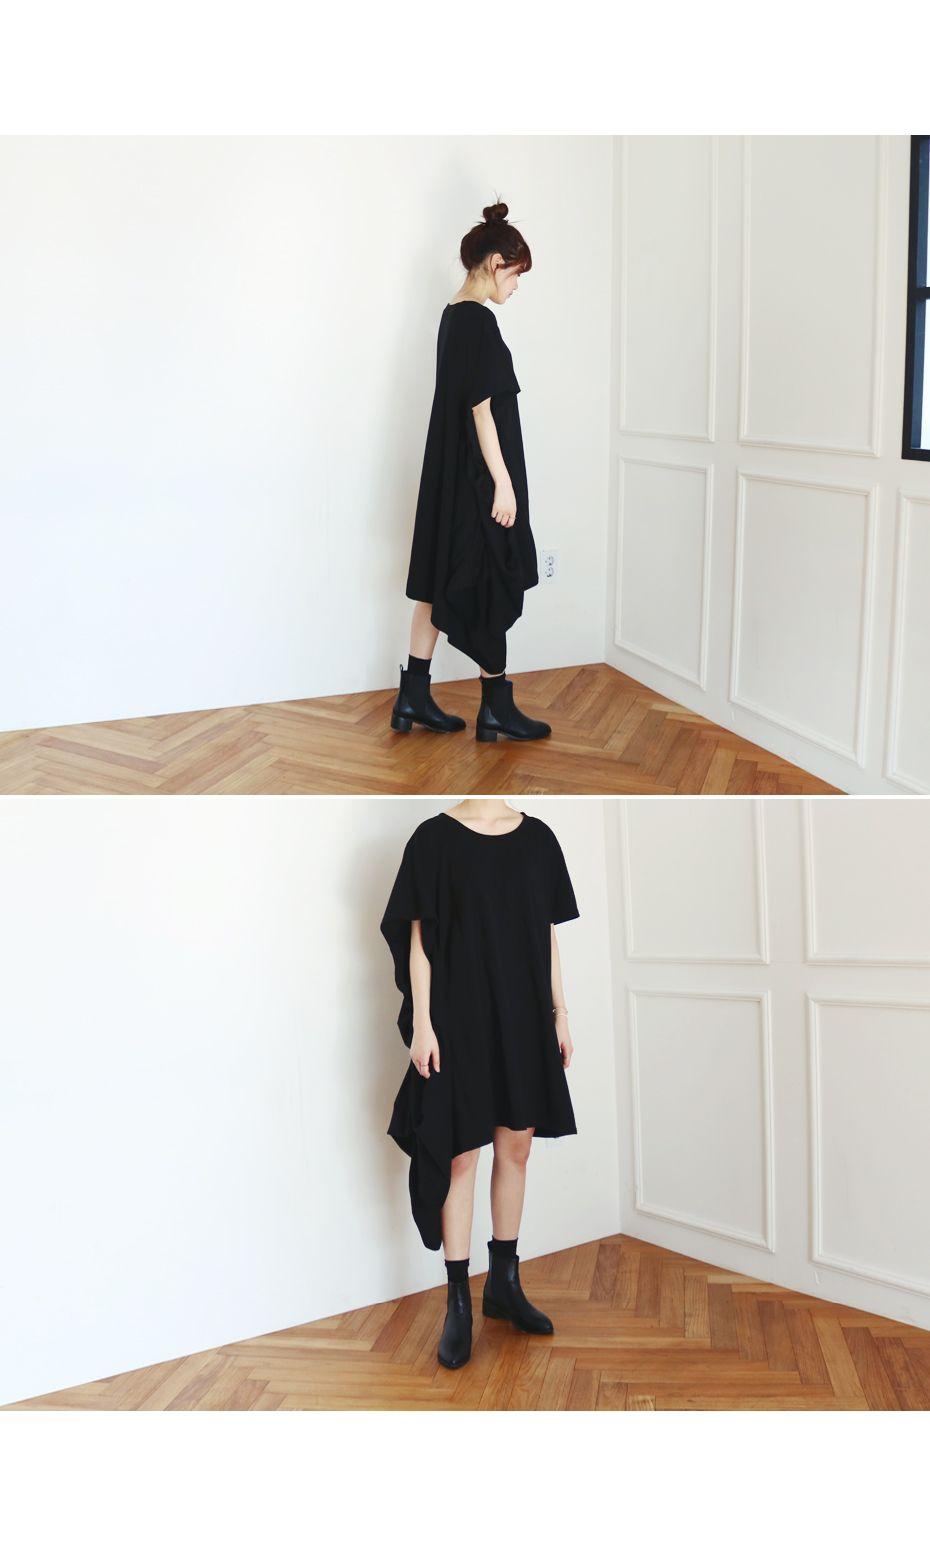 SIBUYA dress 133153 < double avant ops (3way 예요^^) (2차 재입고완료) < FASHION / CLOTHES < WOMEN < DRESSES/SKIRT < dress